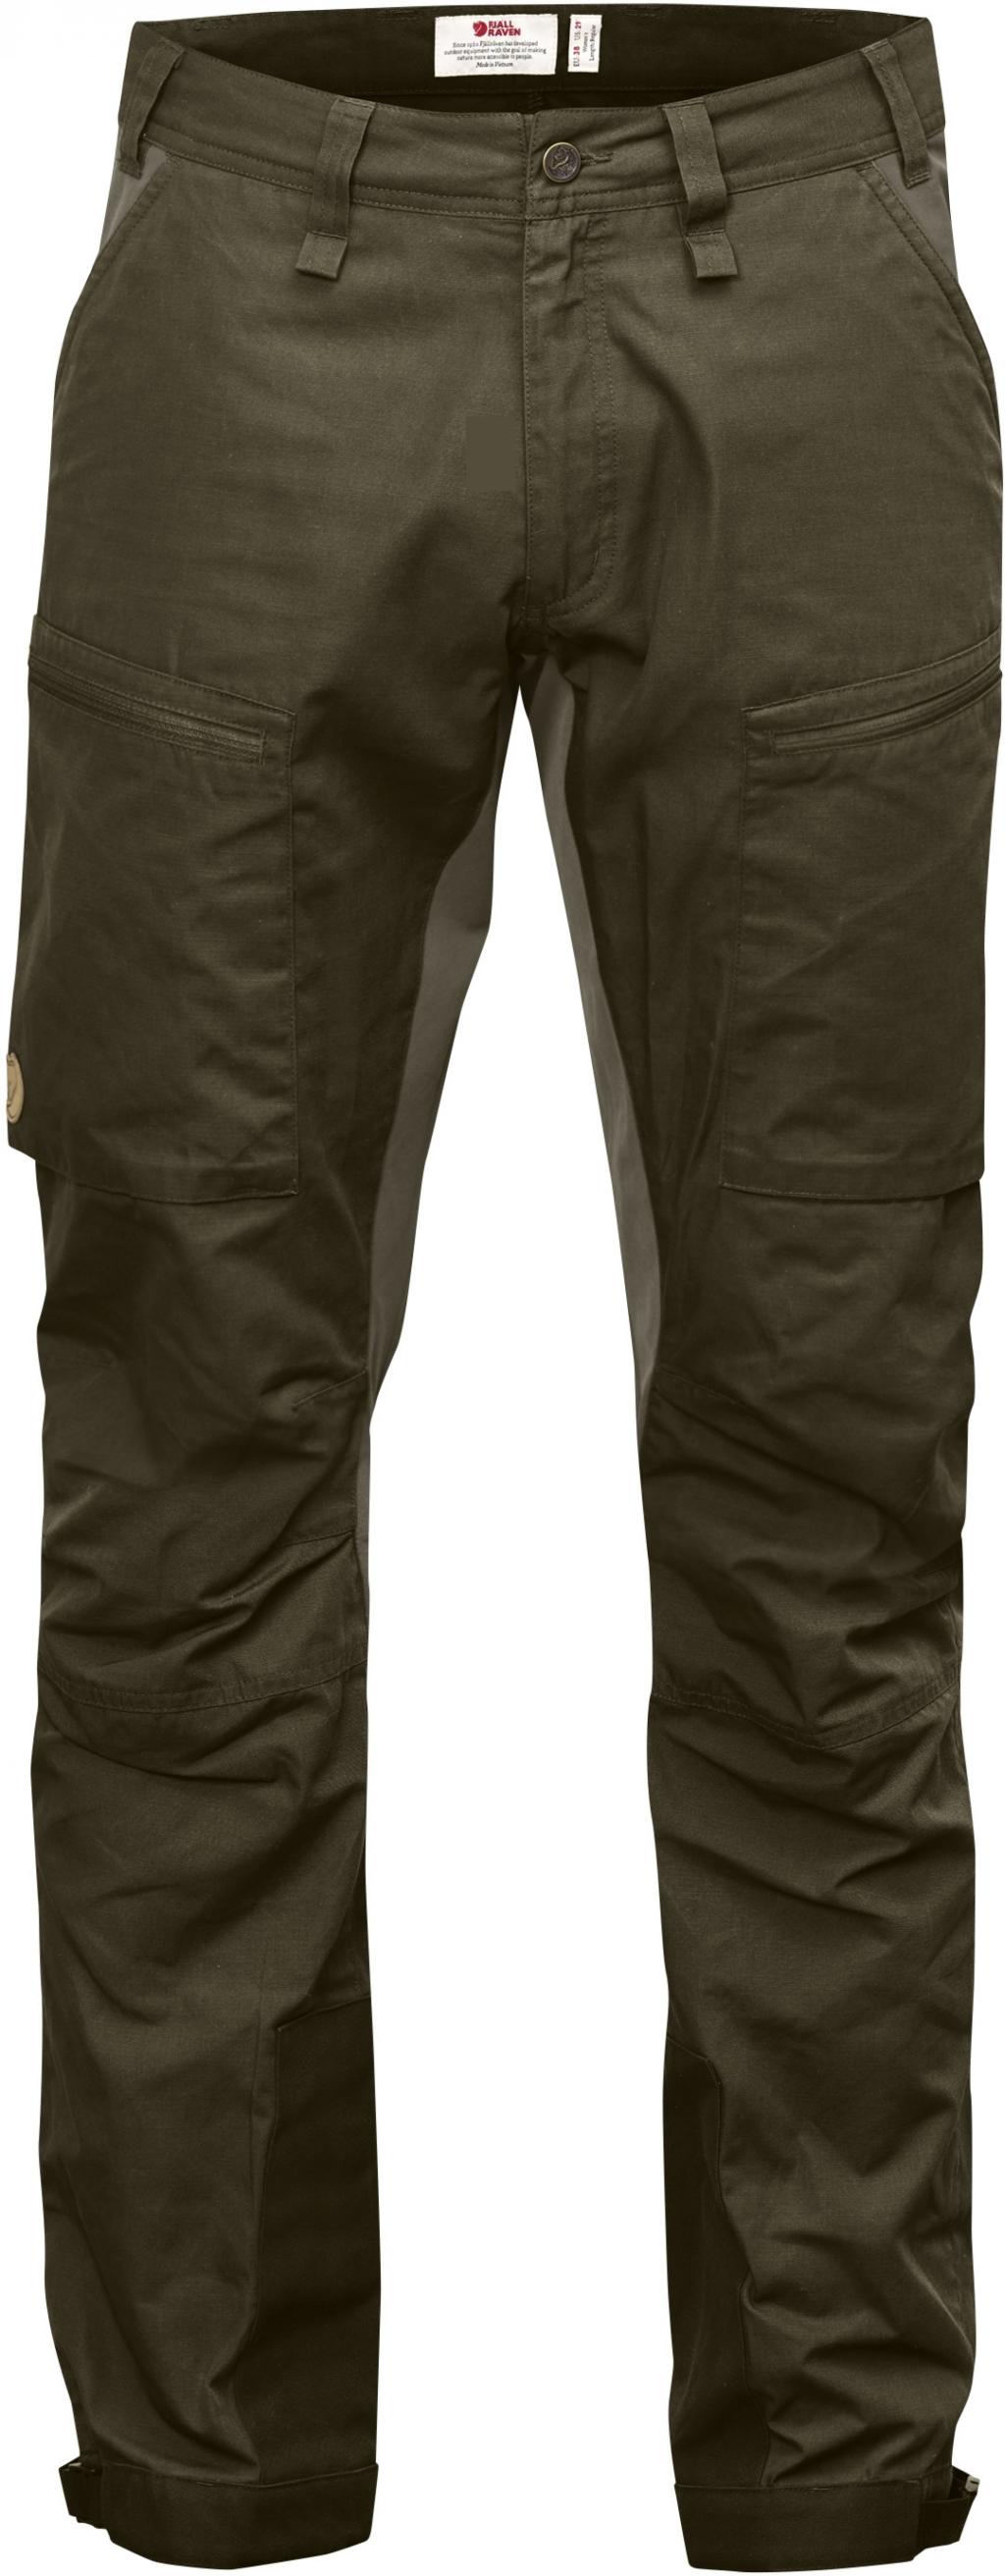 FjallRaven Abisko Lite Trekking Trousers Dark Olive-30